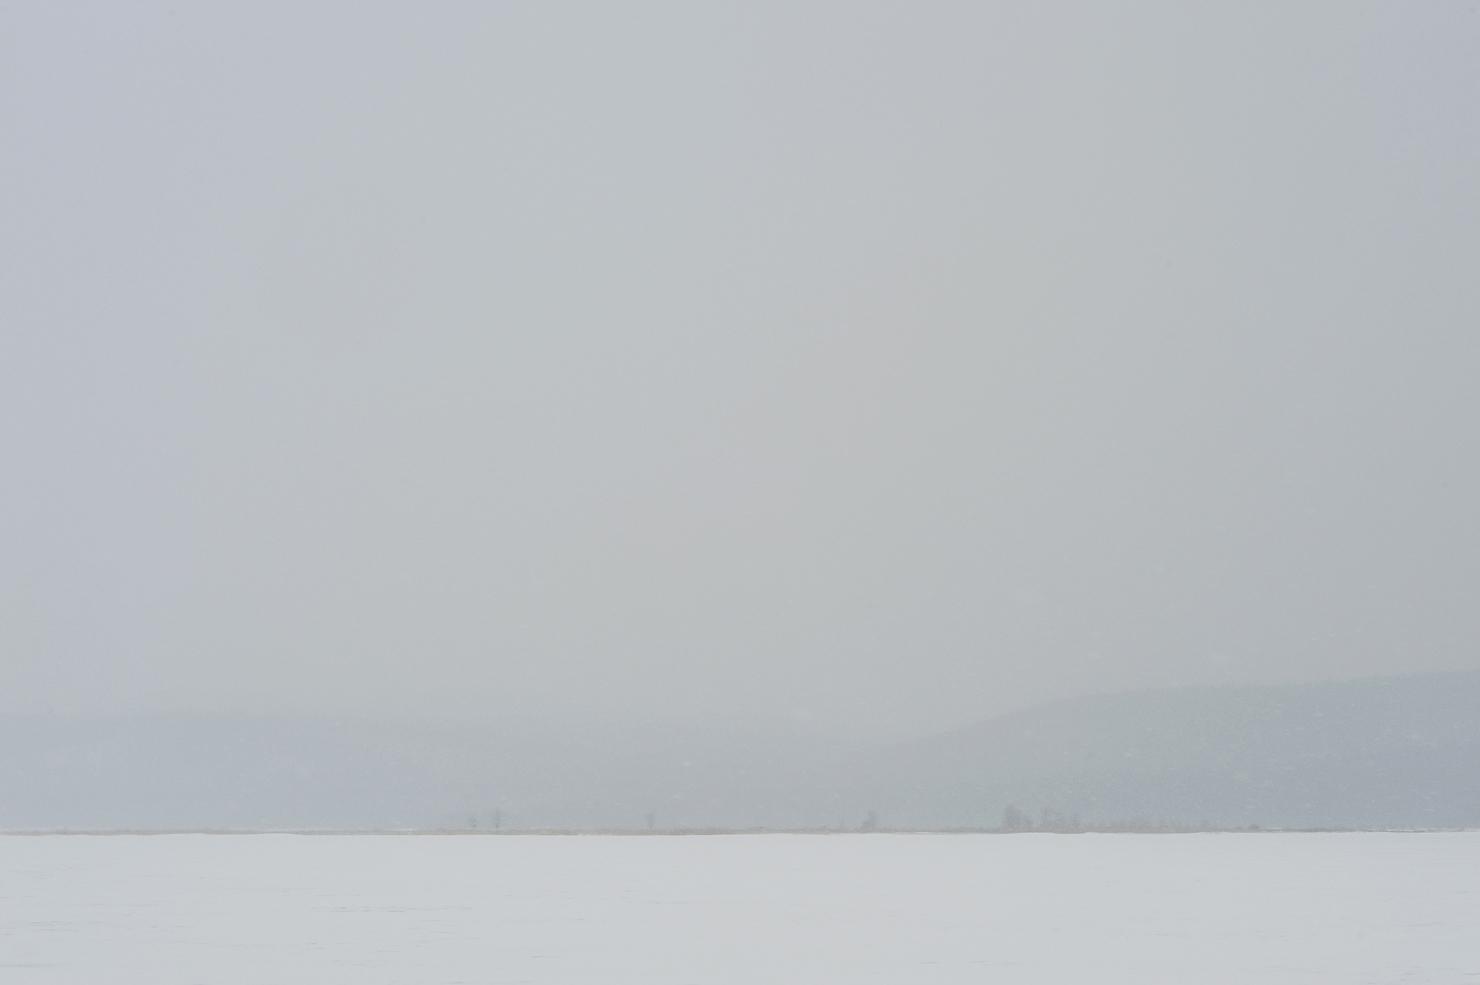 North-East-Bank-no.-4---Thompson-Pond-Area,-Quabbin-Reservoir.jpg